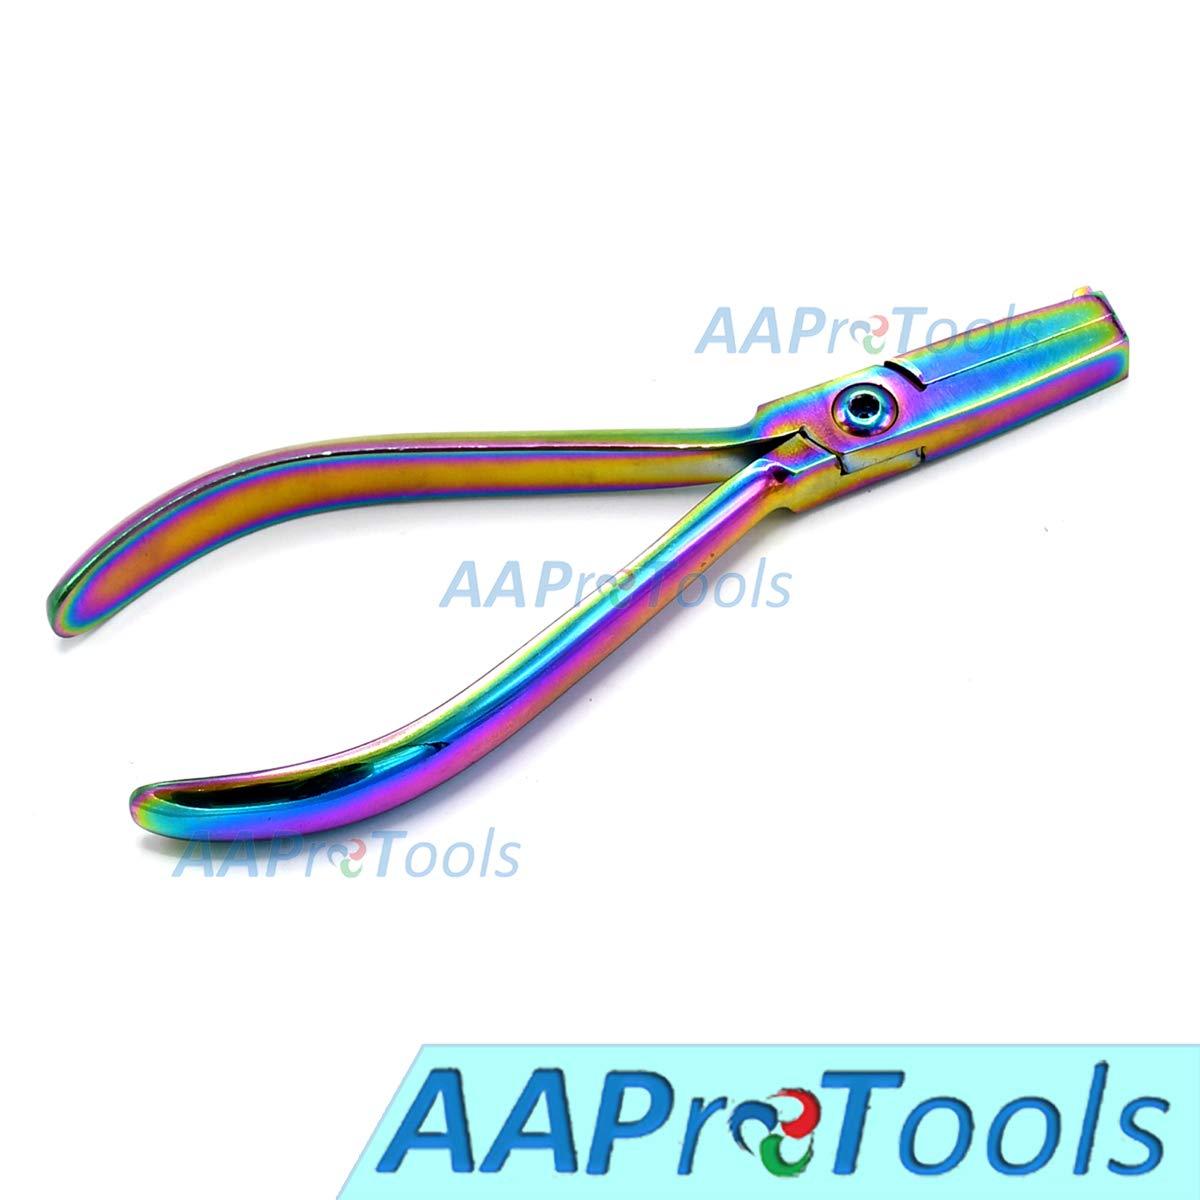 AAProTools Ligature Forming Plier Multi Titanium Rainbow Color Orthodontic Instruments